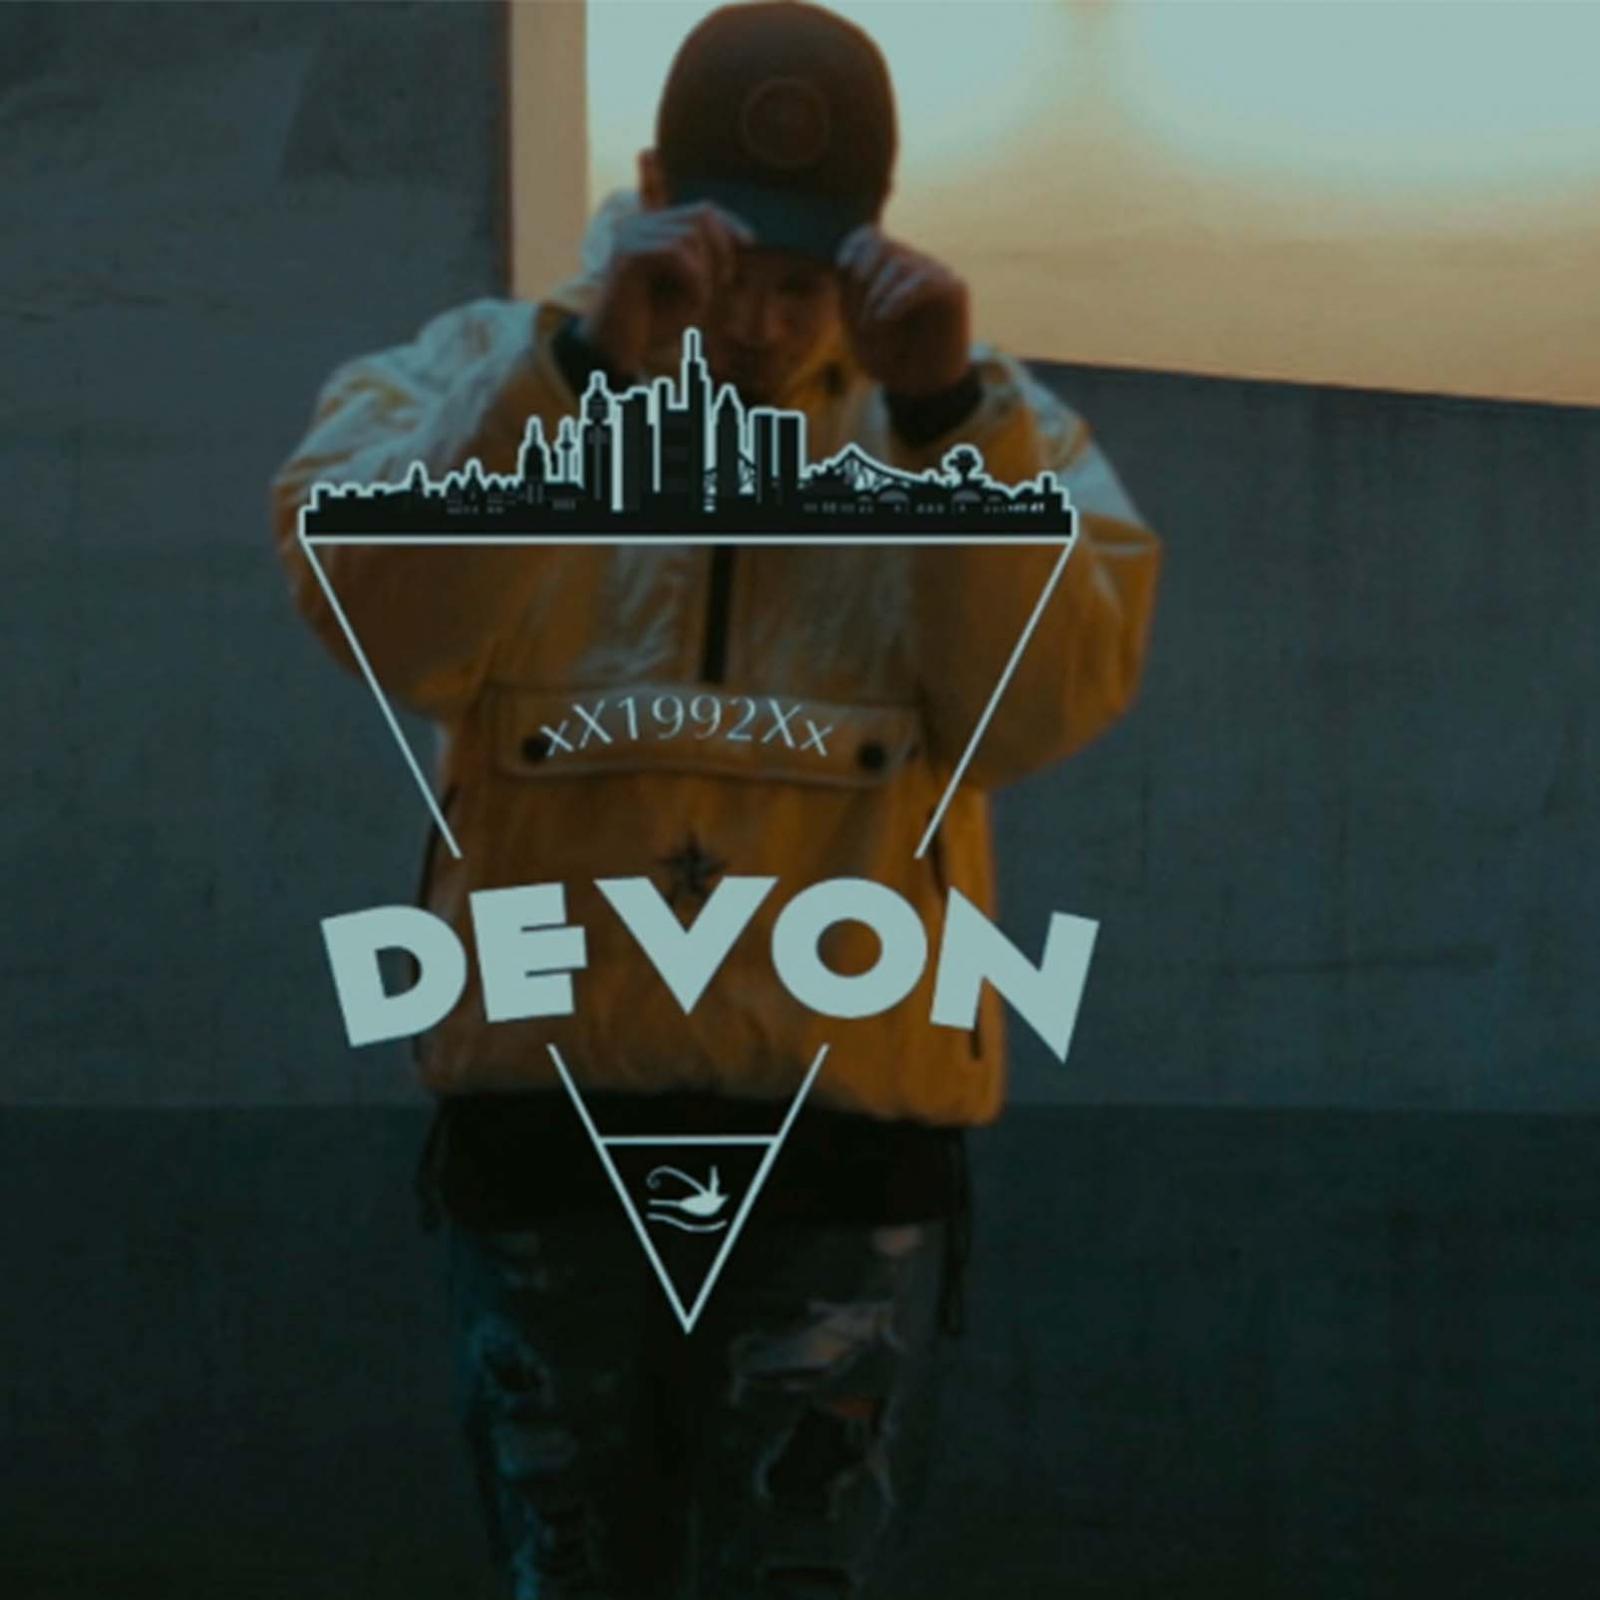 Upcoming: Devon - Egal